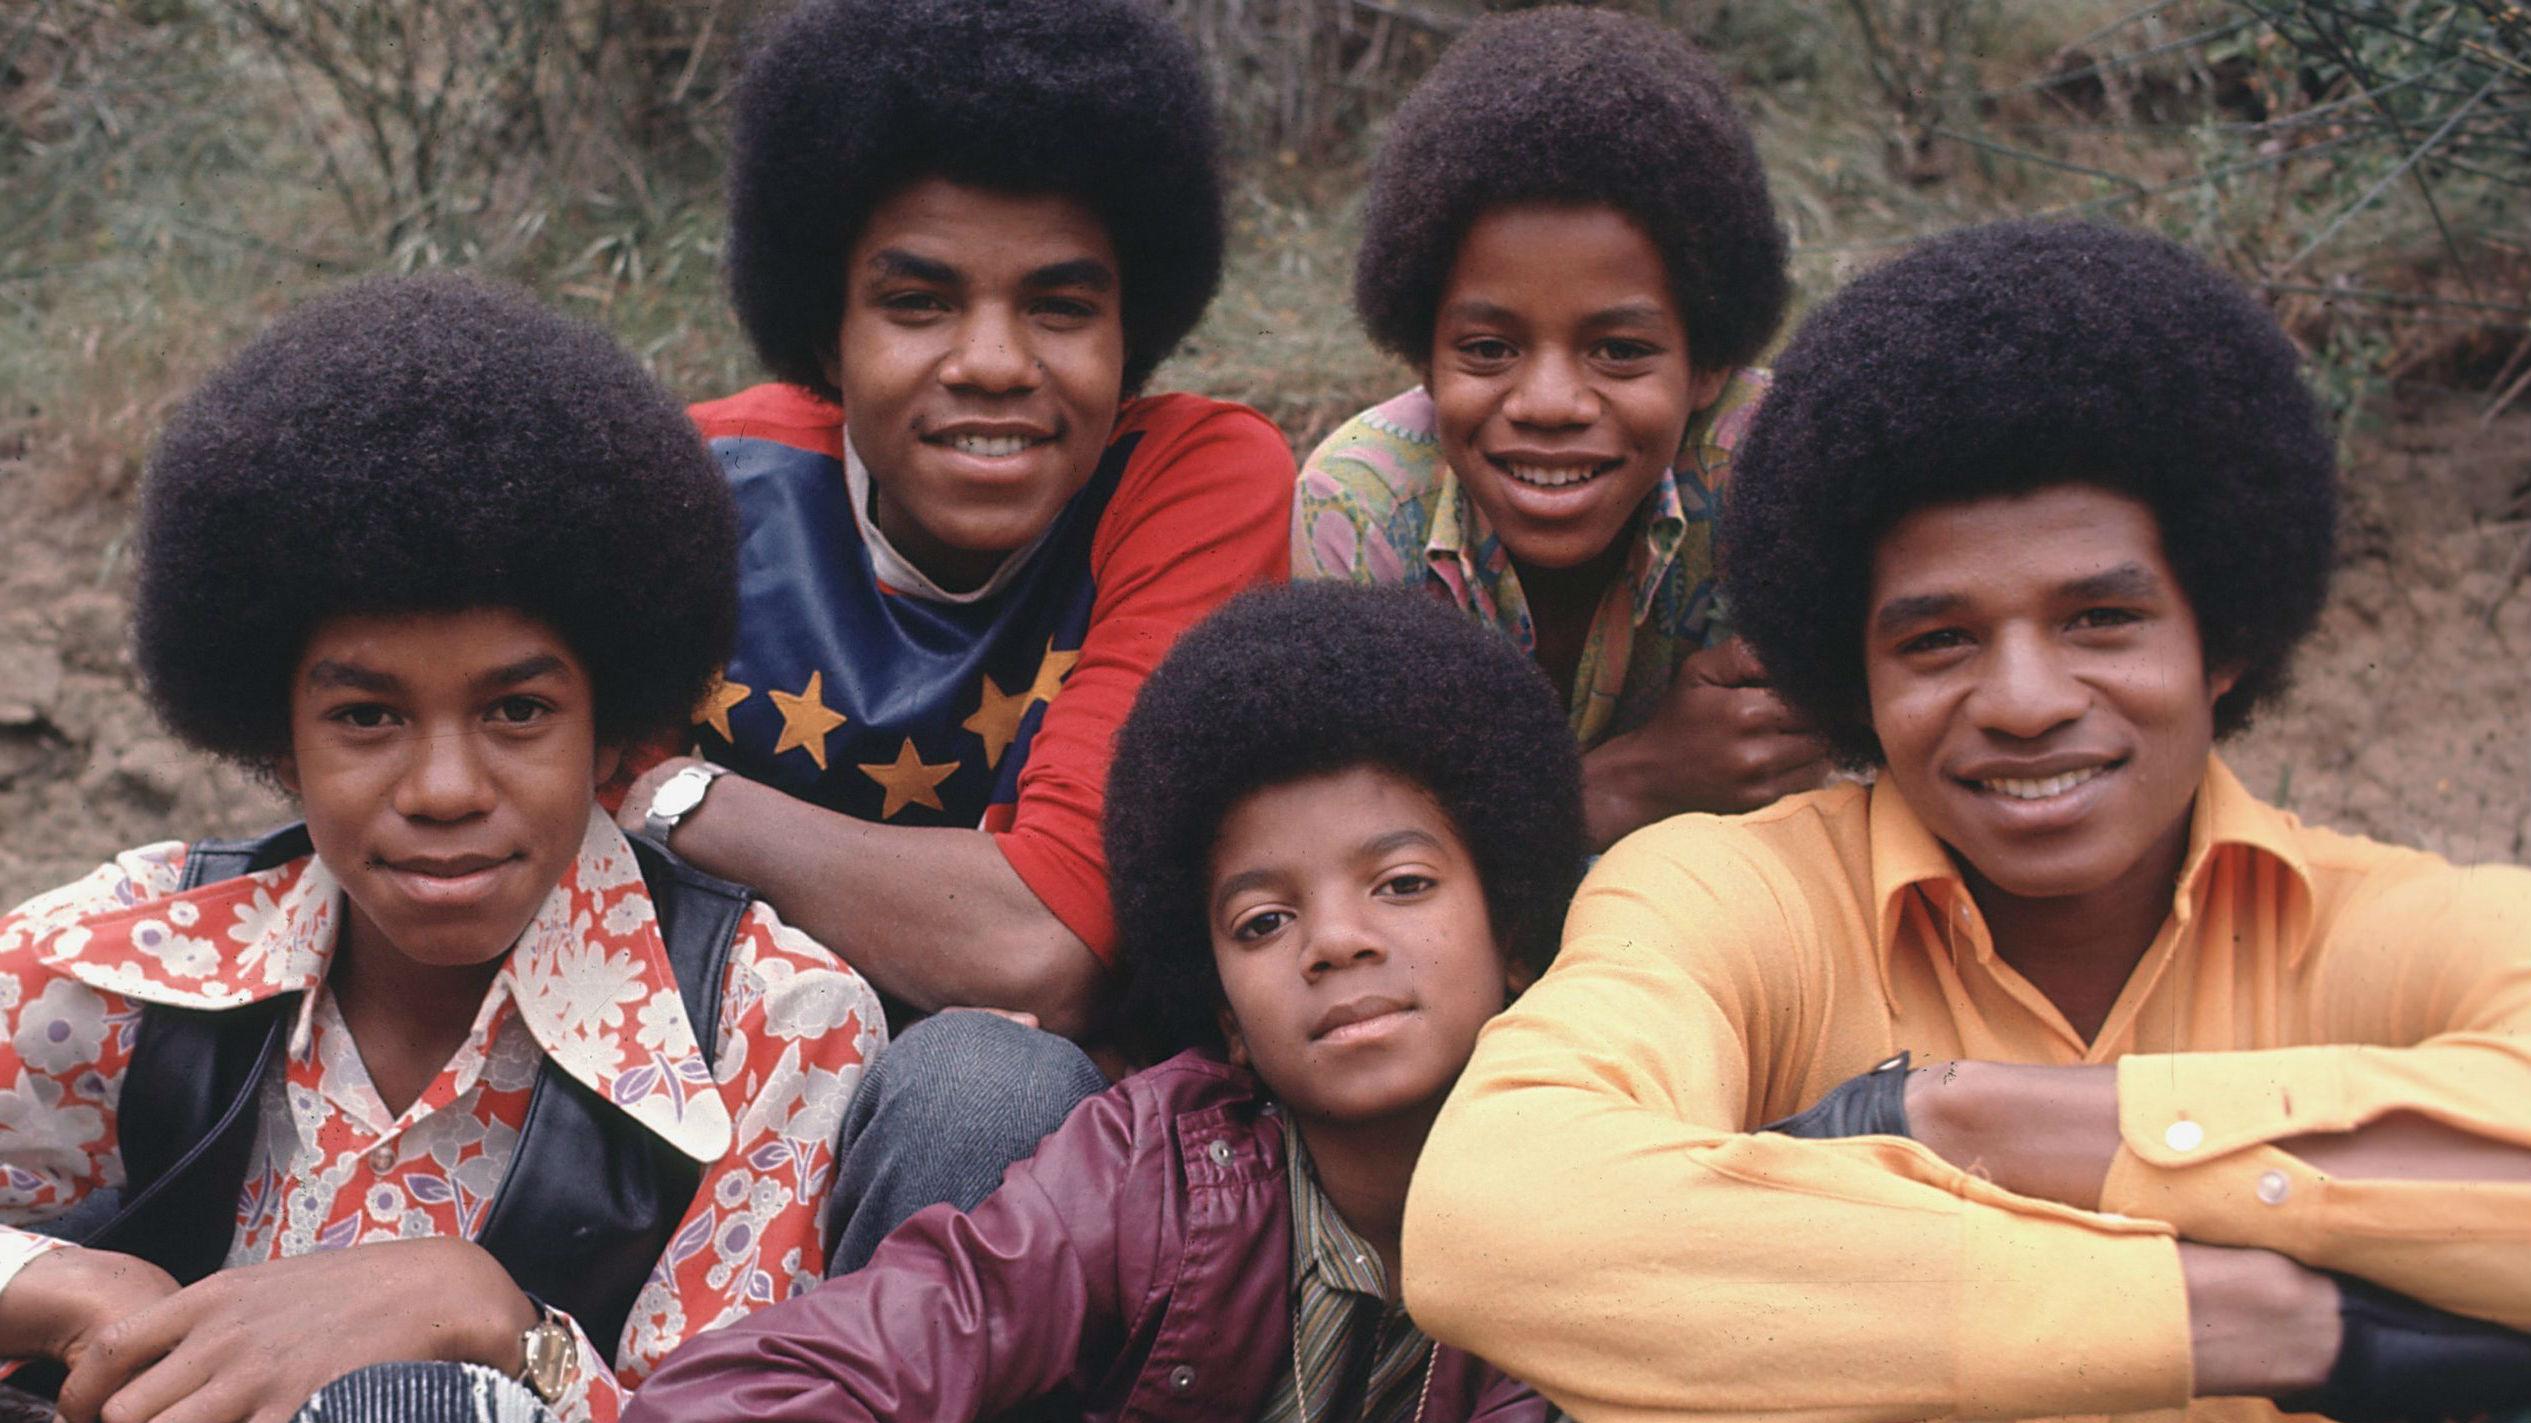 Jackson 5 michael jackson 12701962 2560 1726